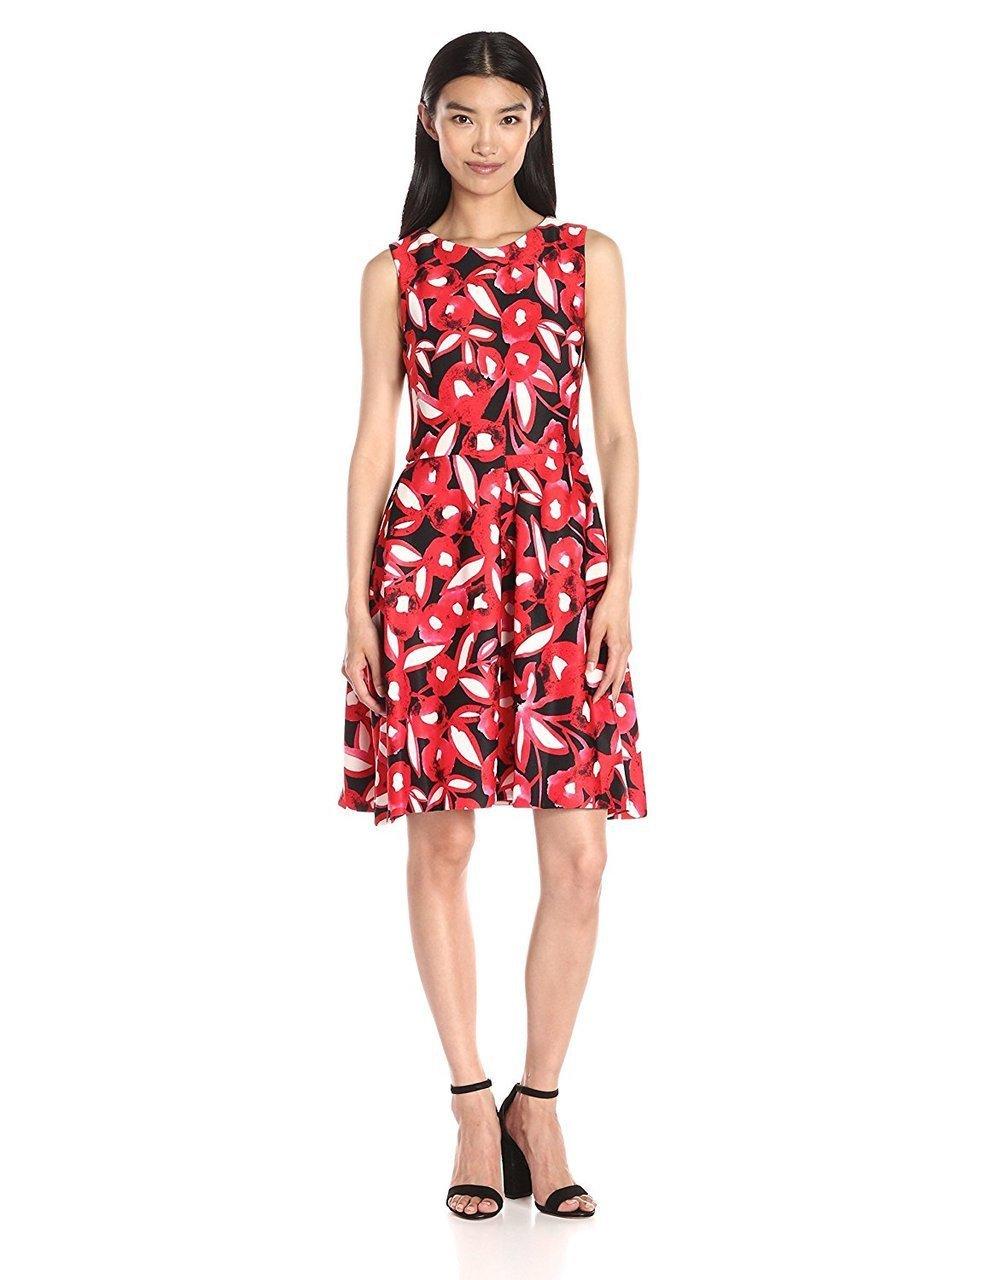 Taylor - Sleeveless Floral Jewel Neck Dress 8410M